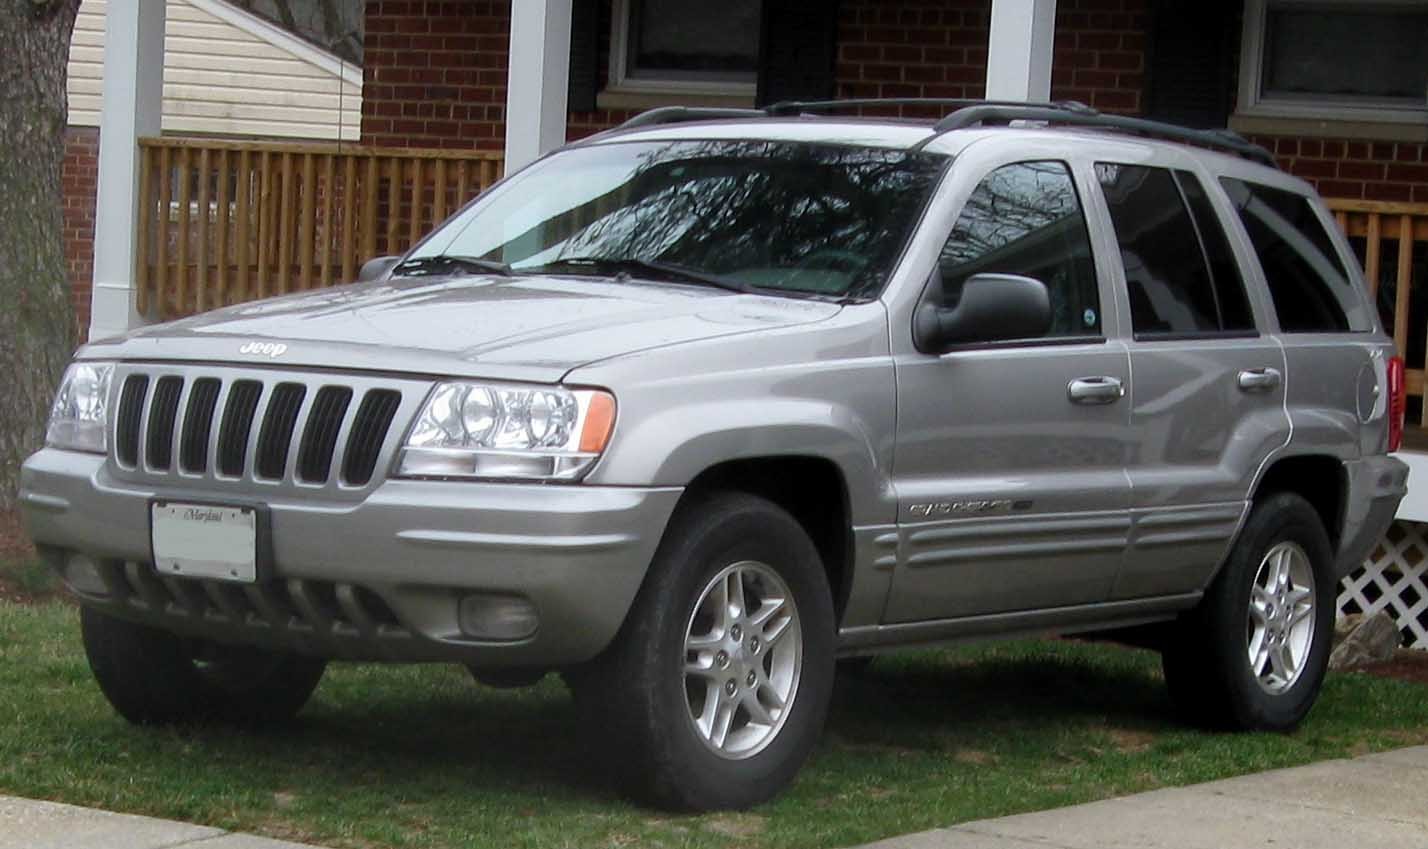 2003 Jeep Grand Cherokee #1 Jeep Grand Cherokee #1